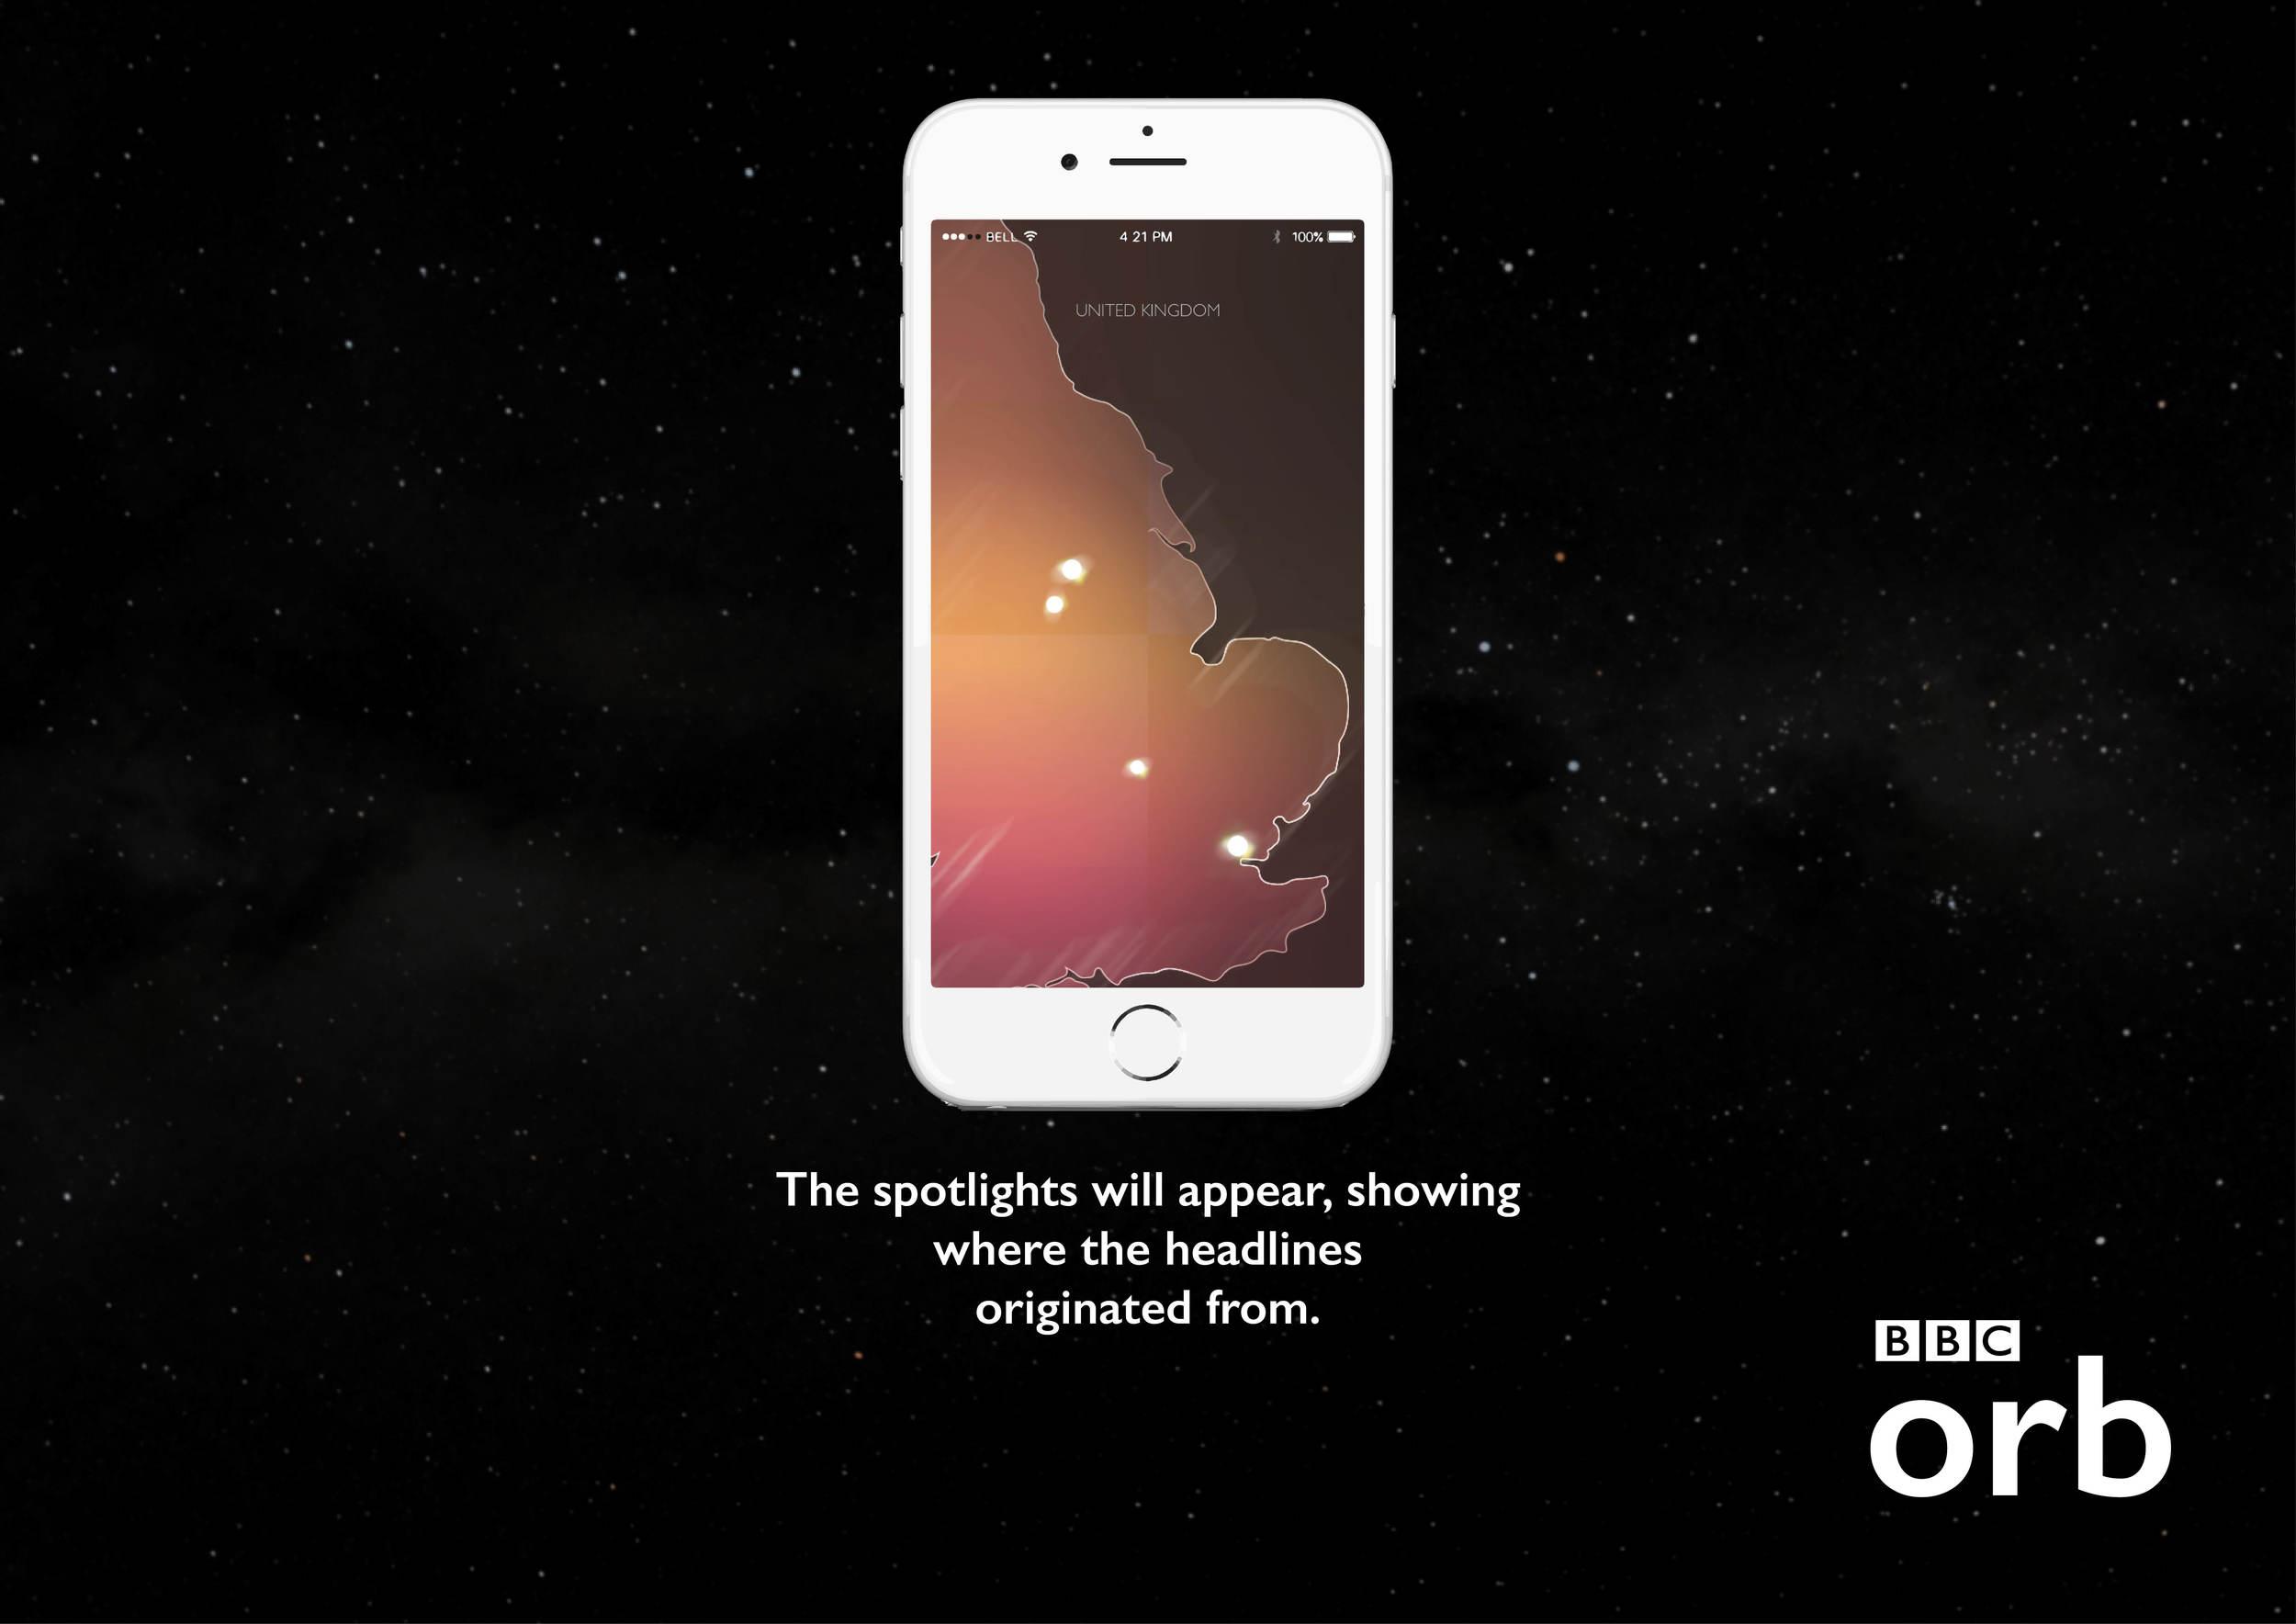 BBC Orb presentation4.jpg